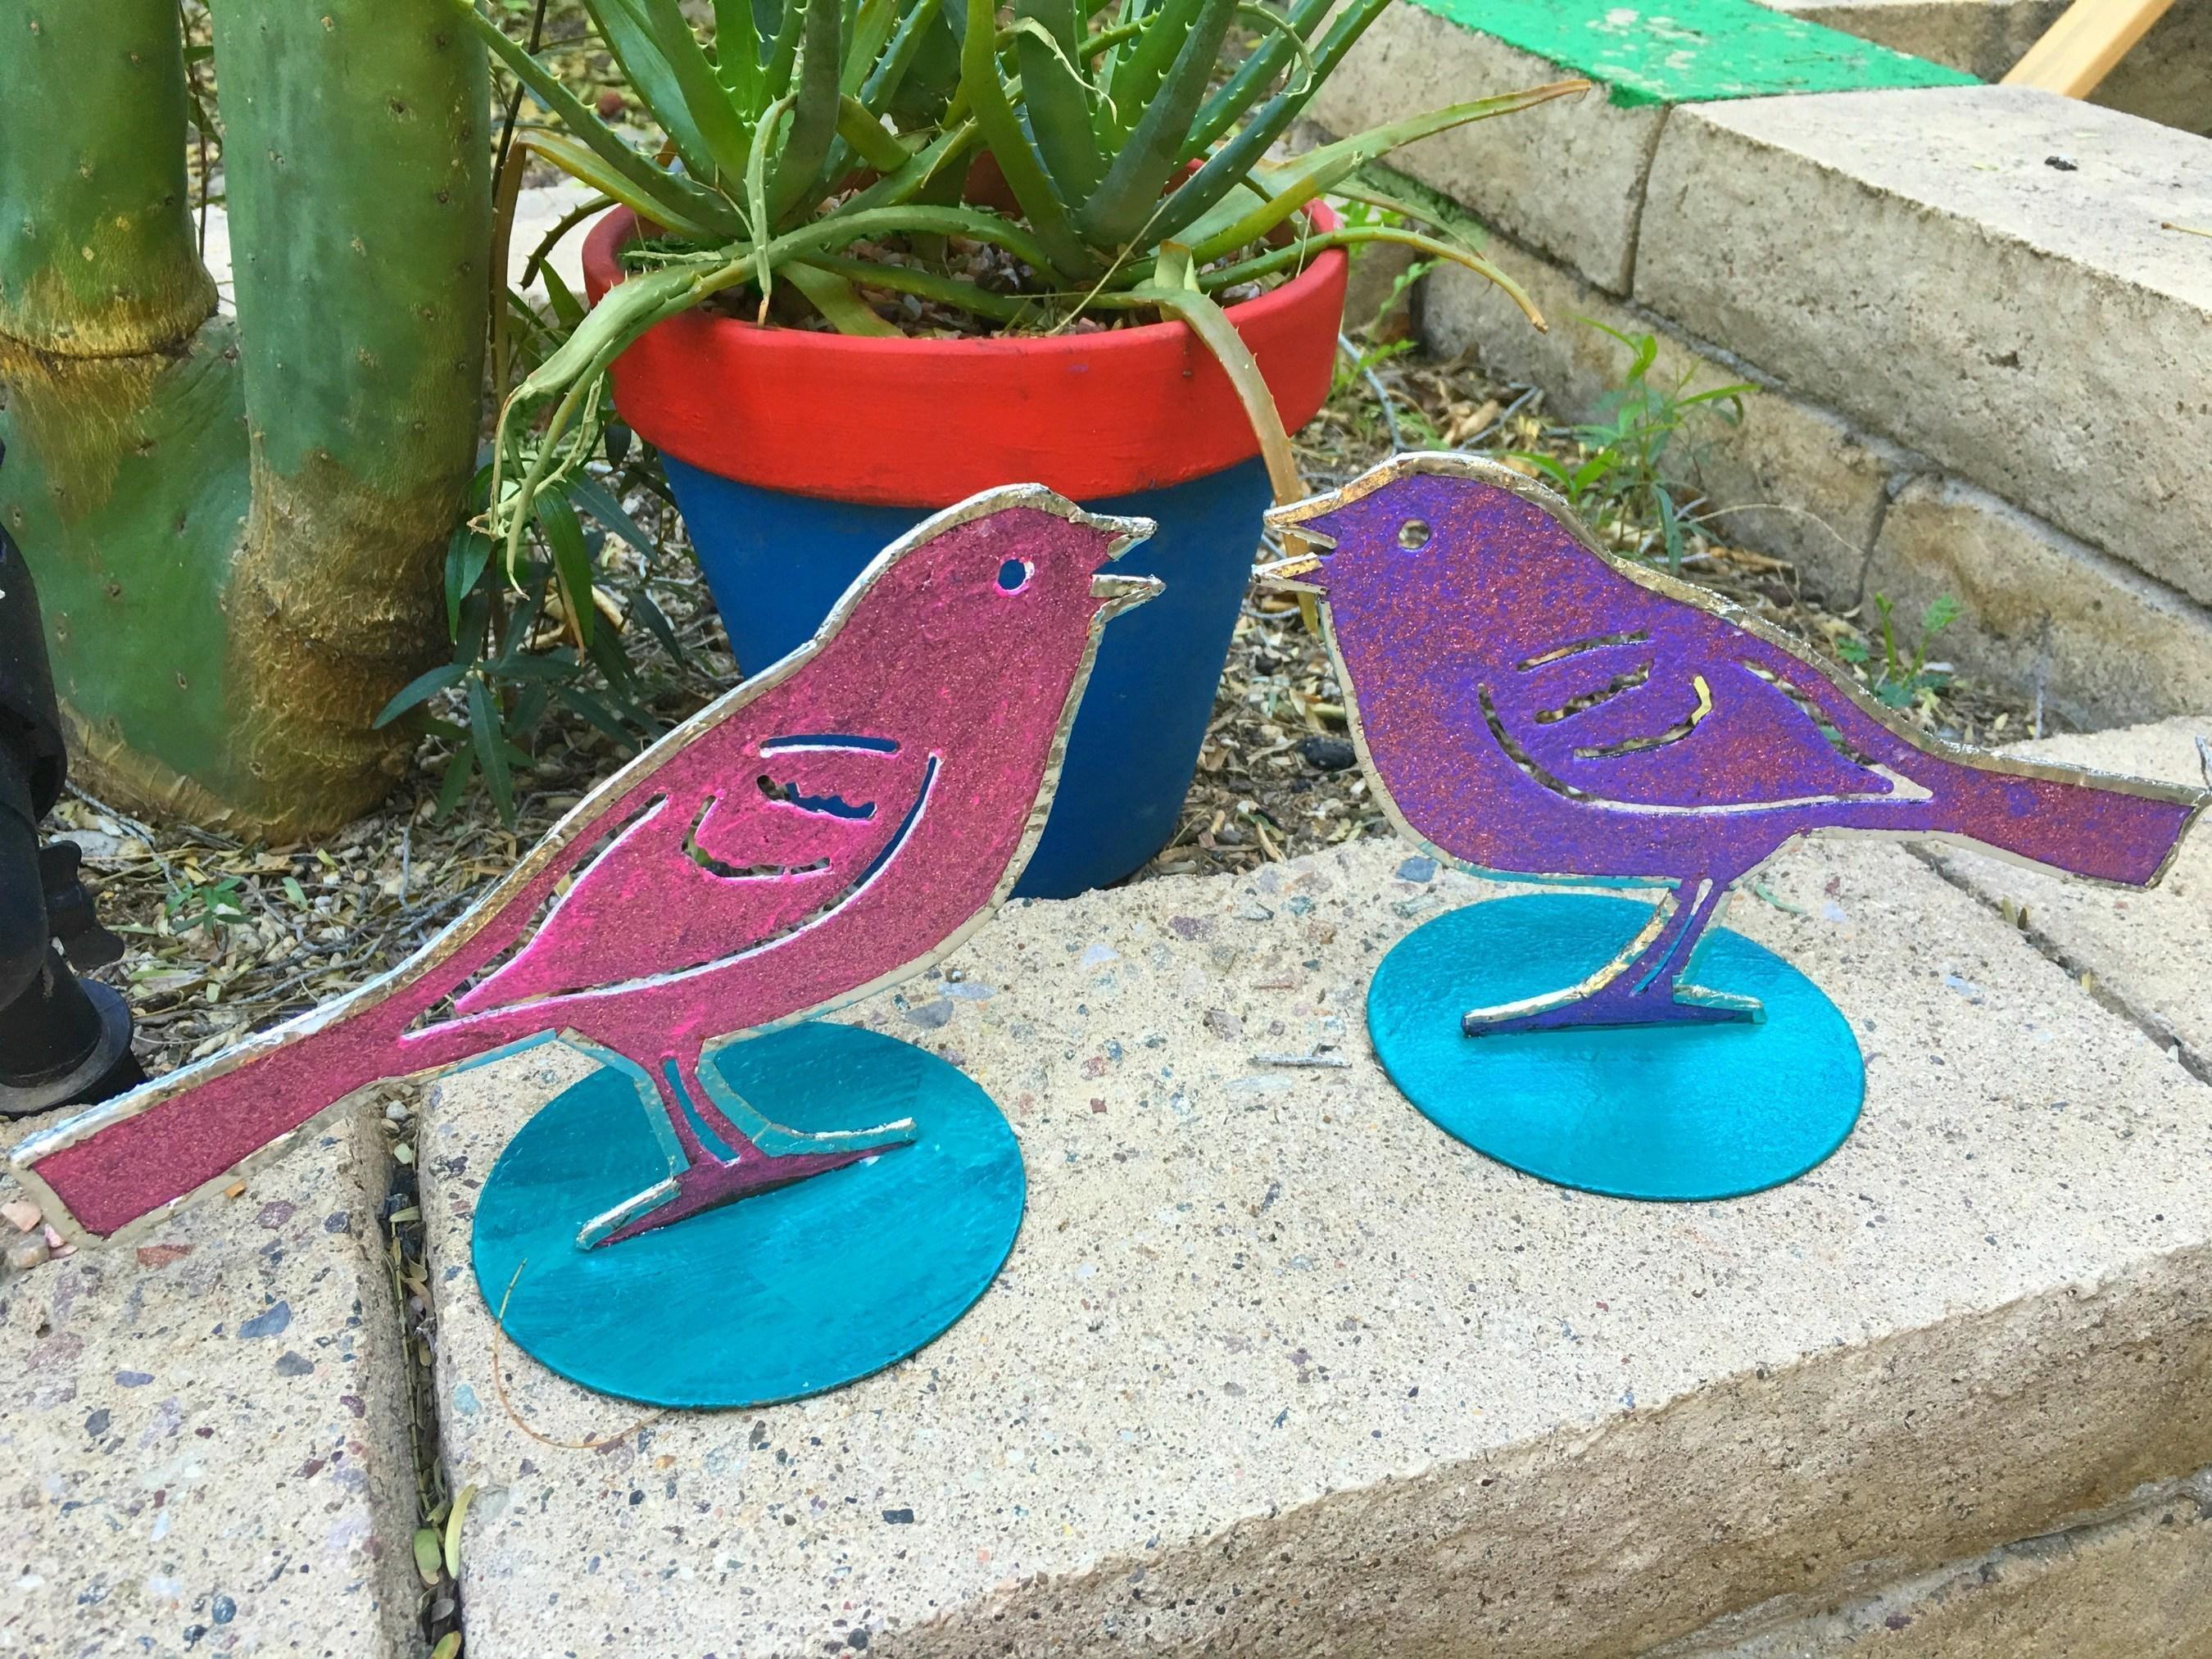 Crafty Chica's stunning soldered birds. (Crafty Chica)